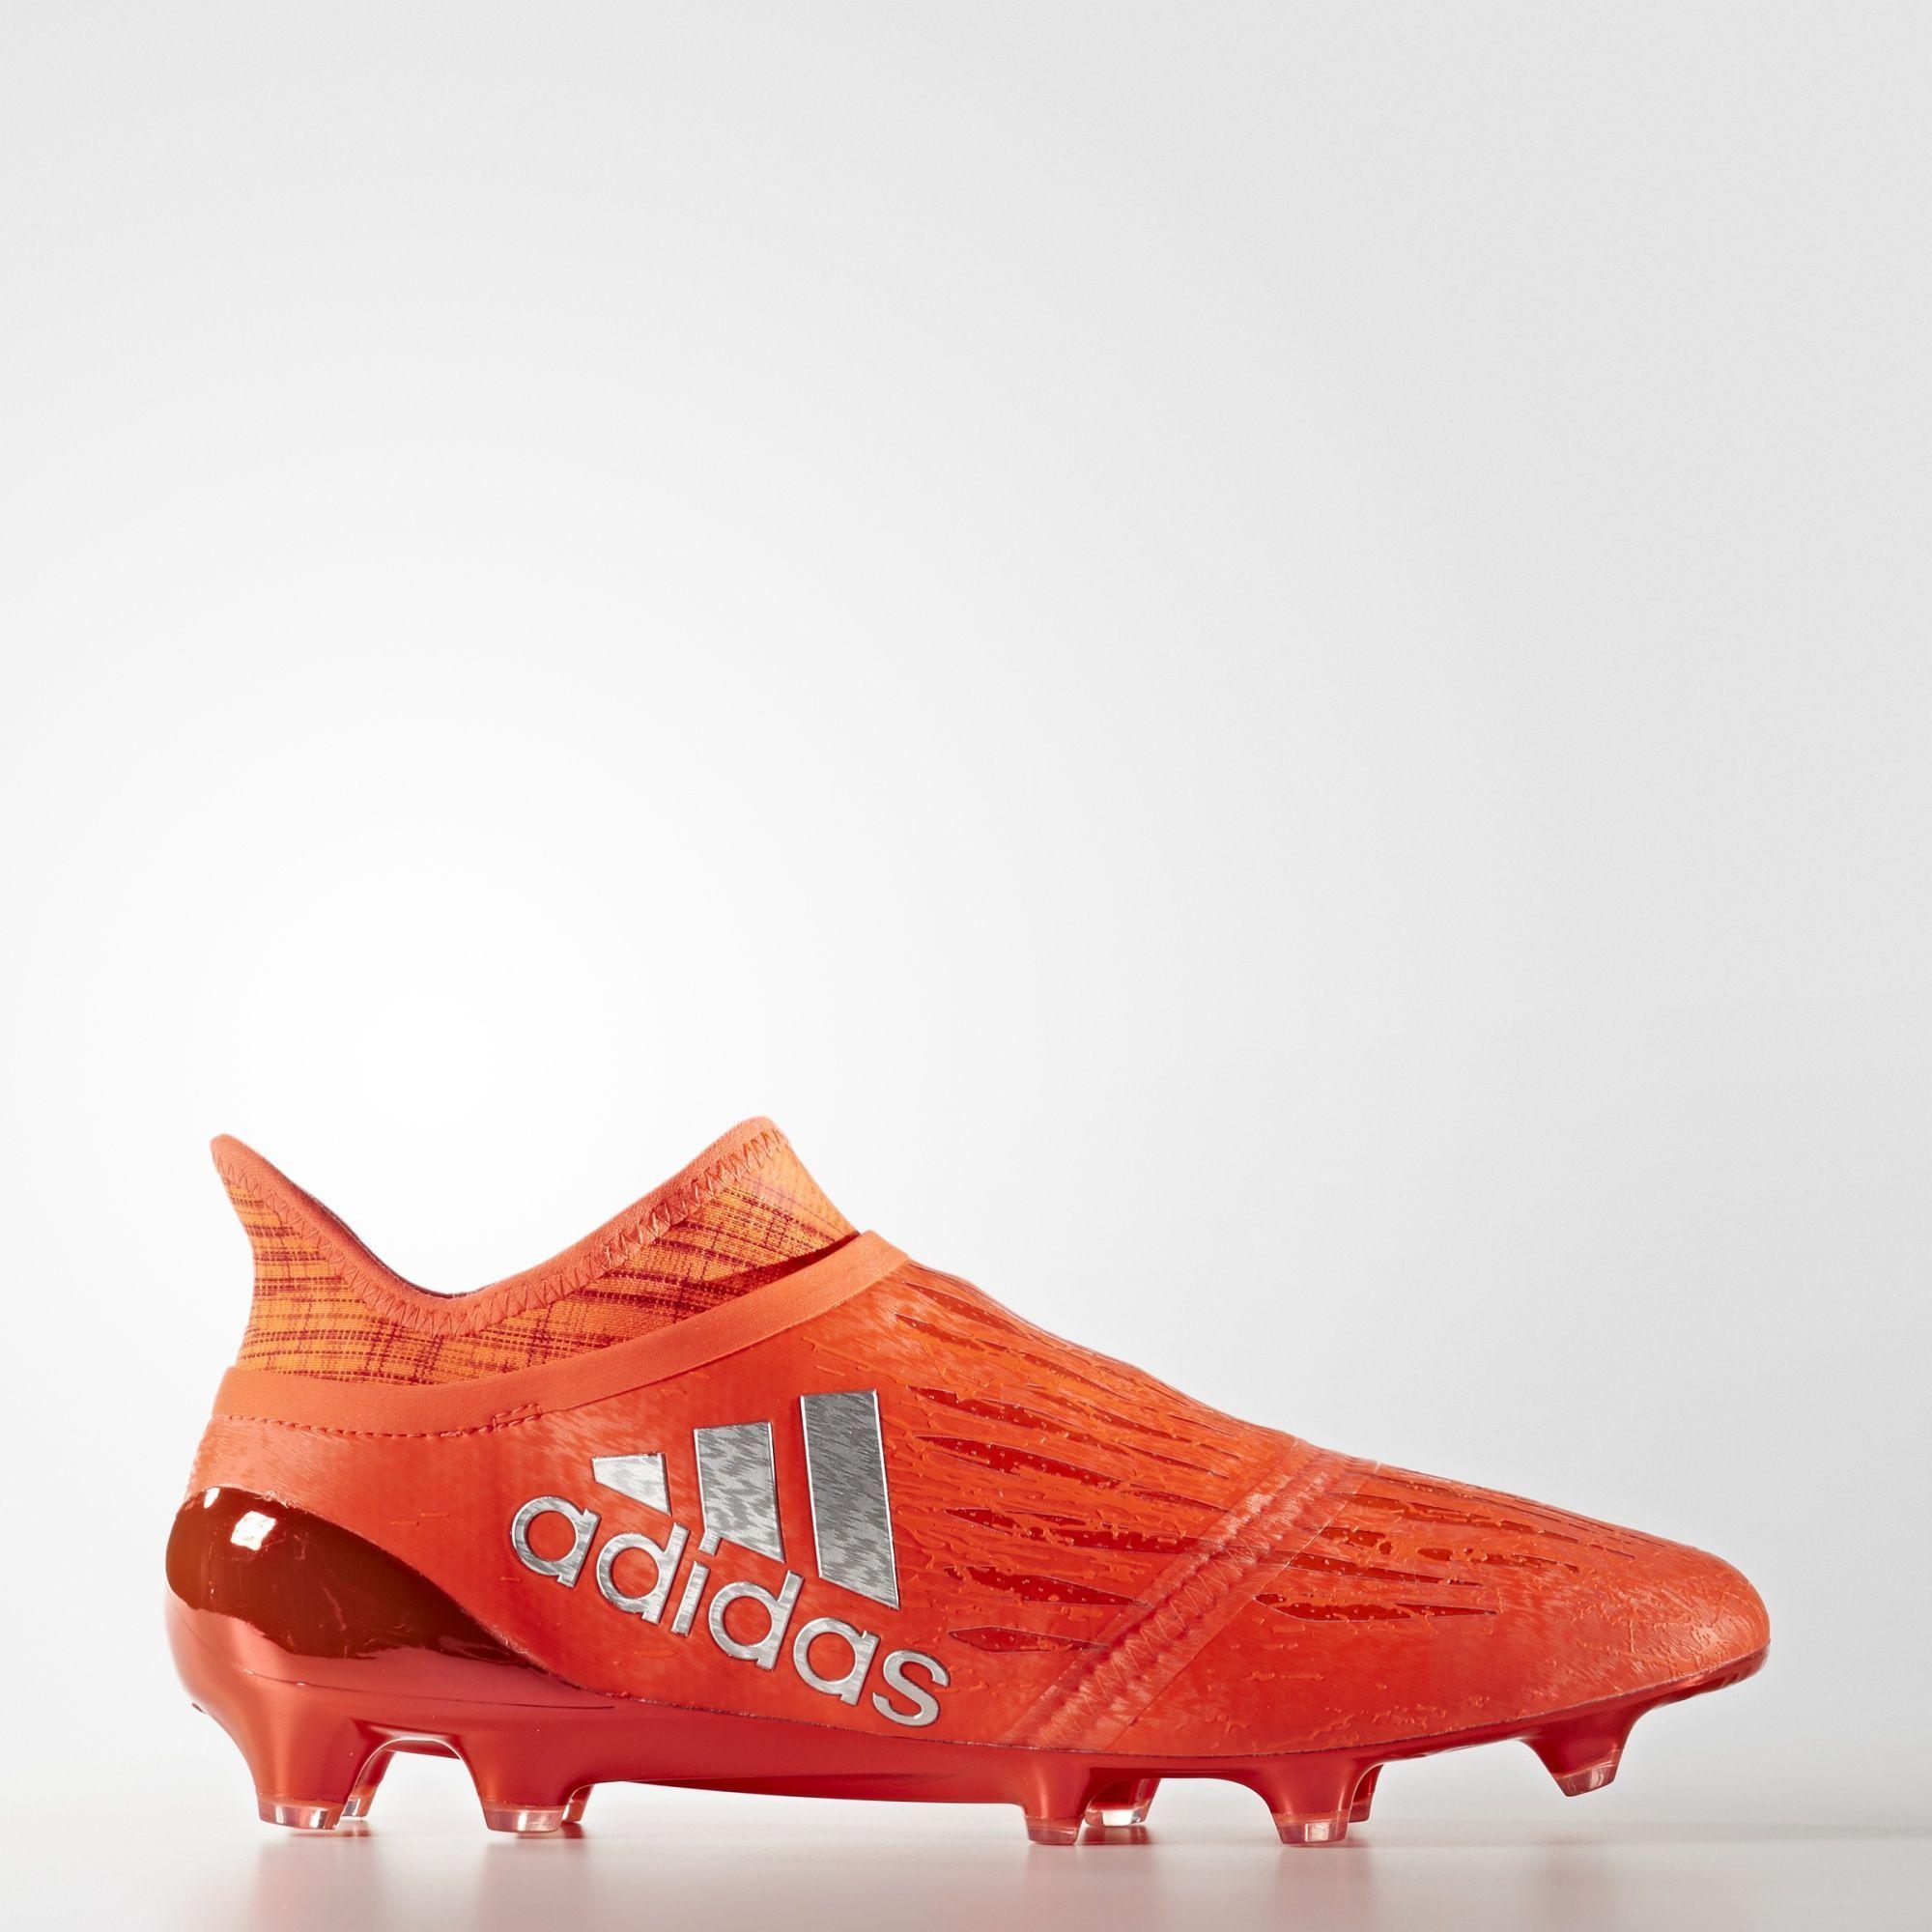 adidas - X 16+ Purechaos Firm Ground Boots  a4de09aae83a5